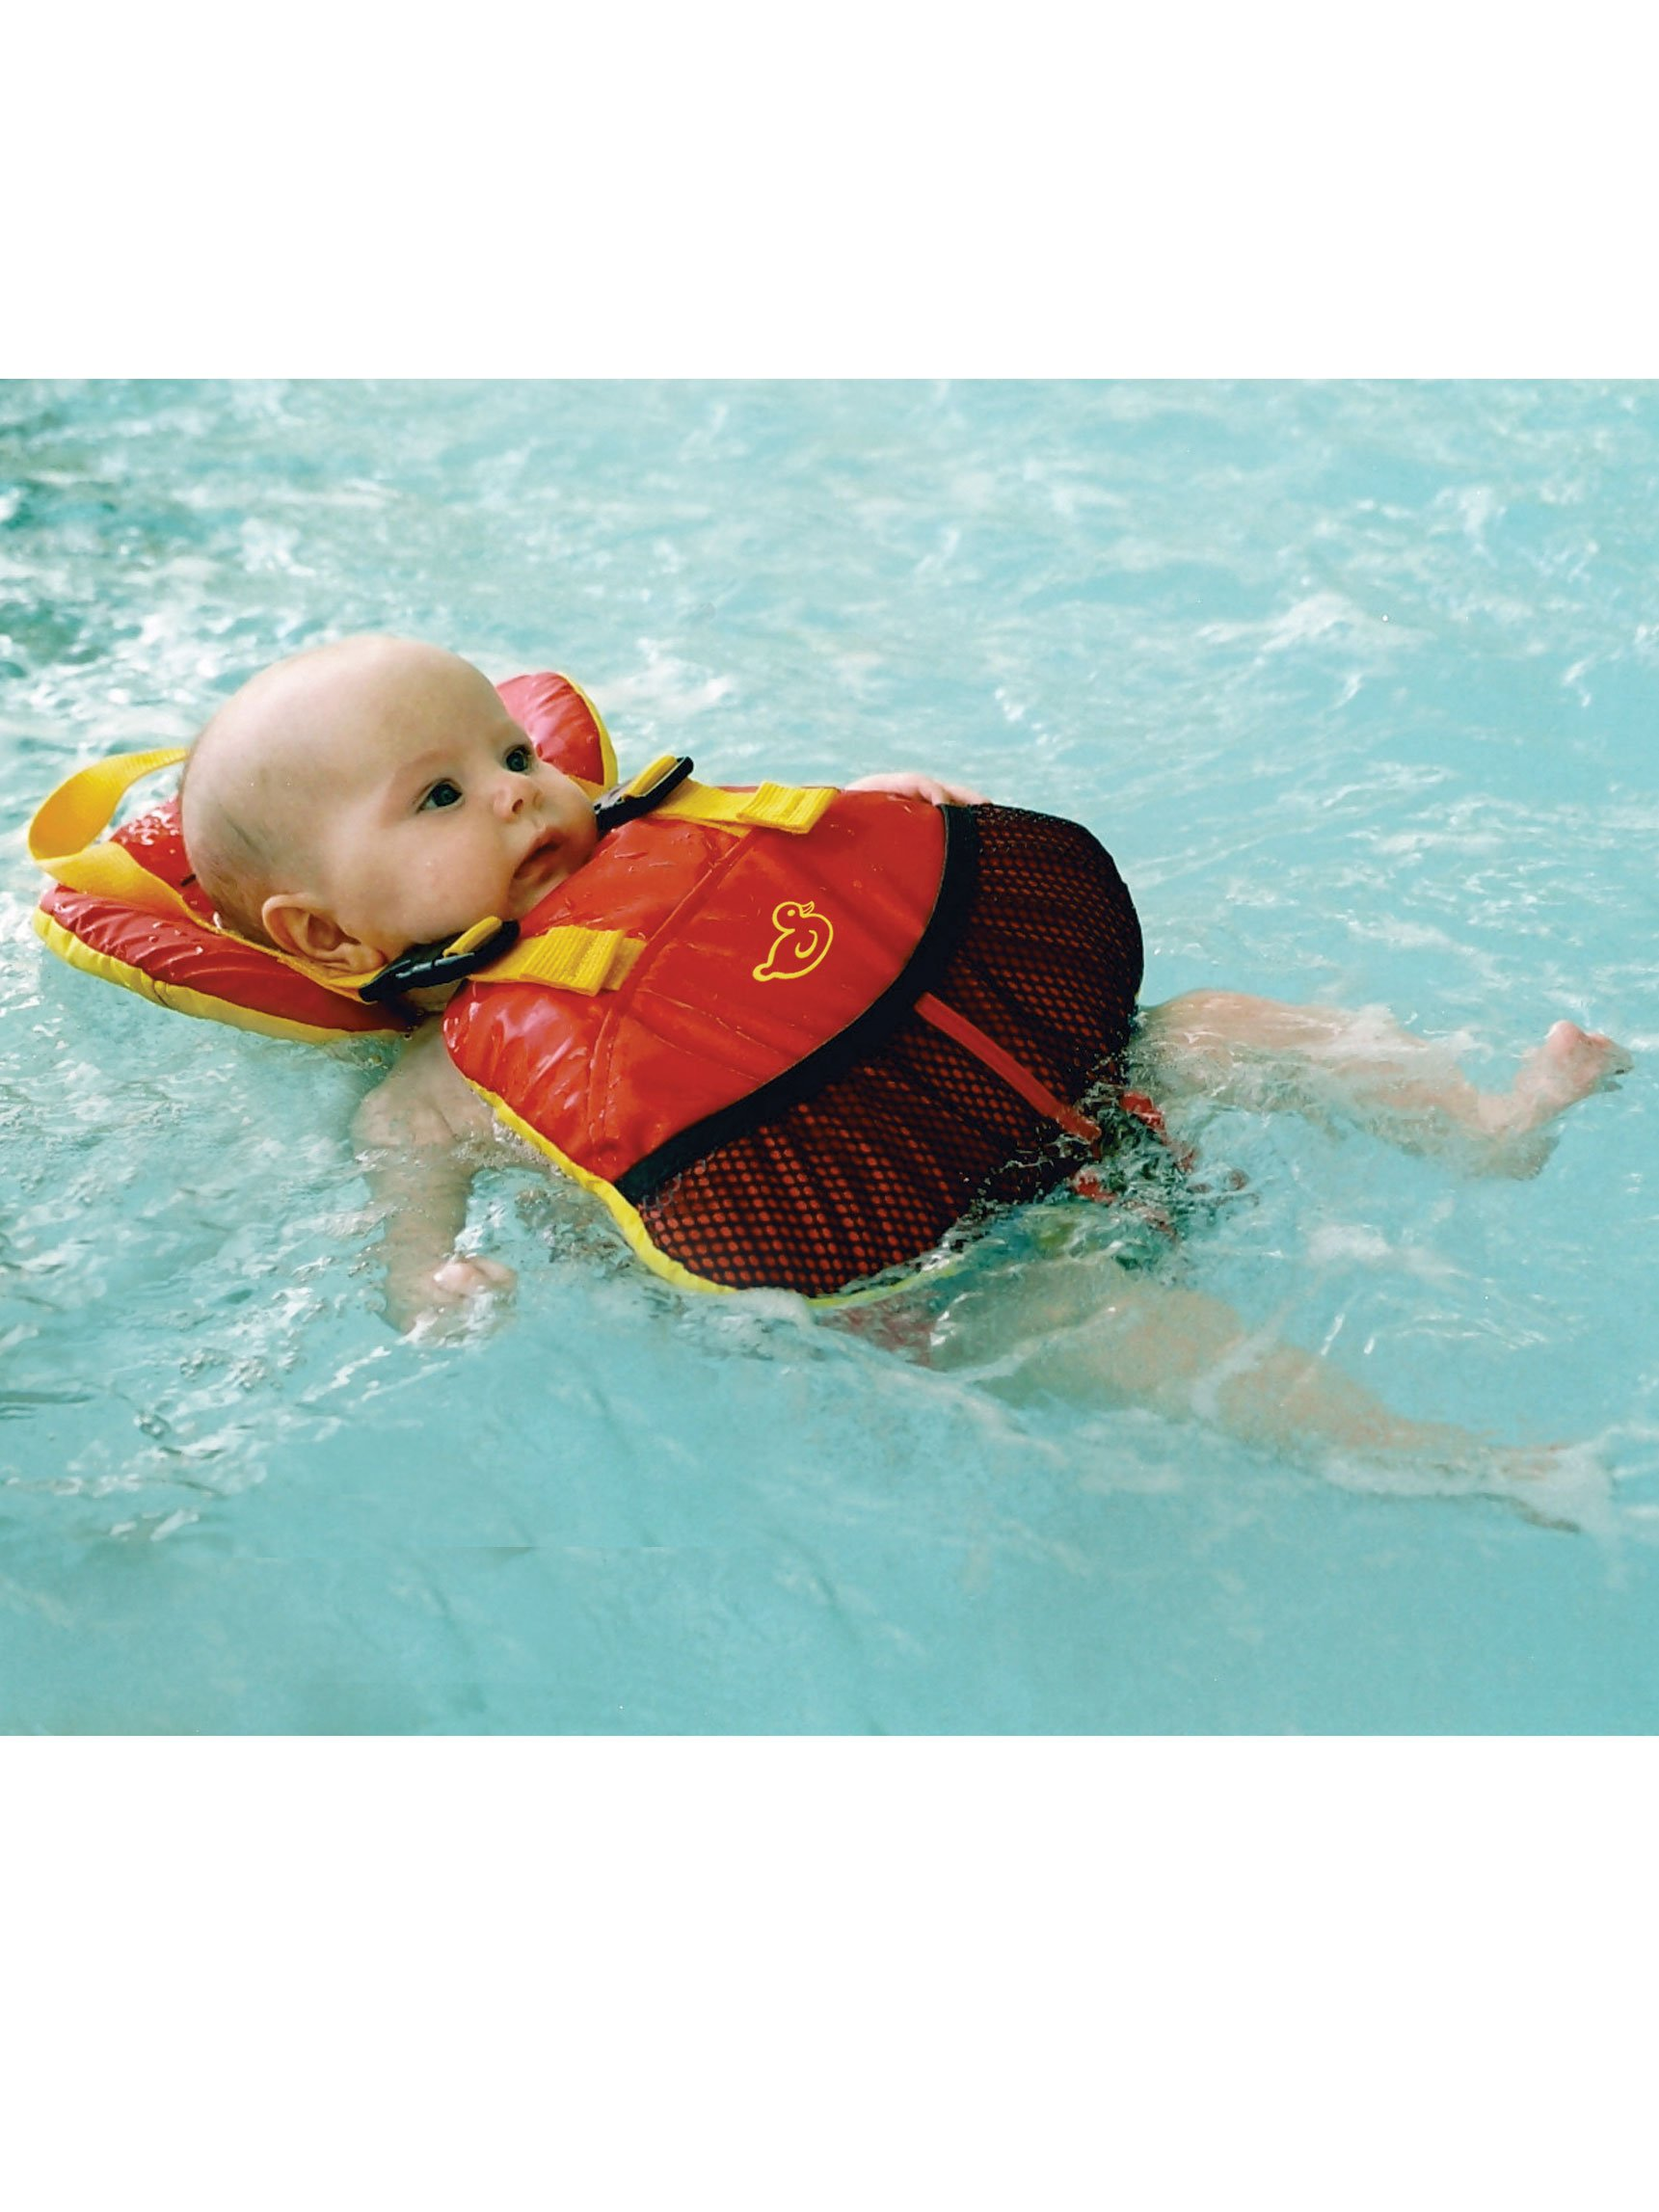 Salus Bijoux Baby Vest - Red by Salus (Image #3)